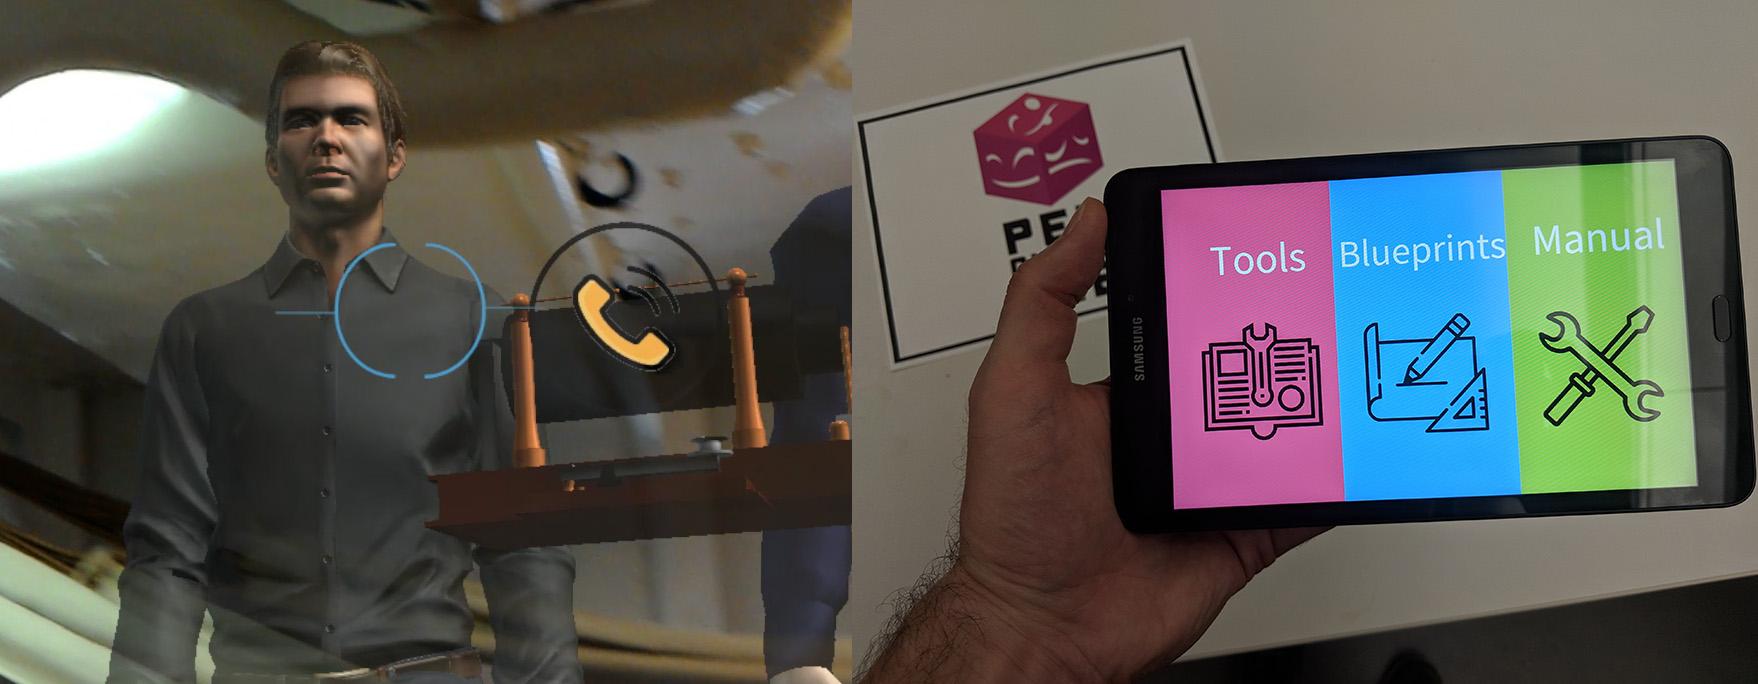 Scuttlebuddy AR prototype and companion app screenshots